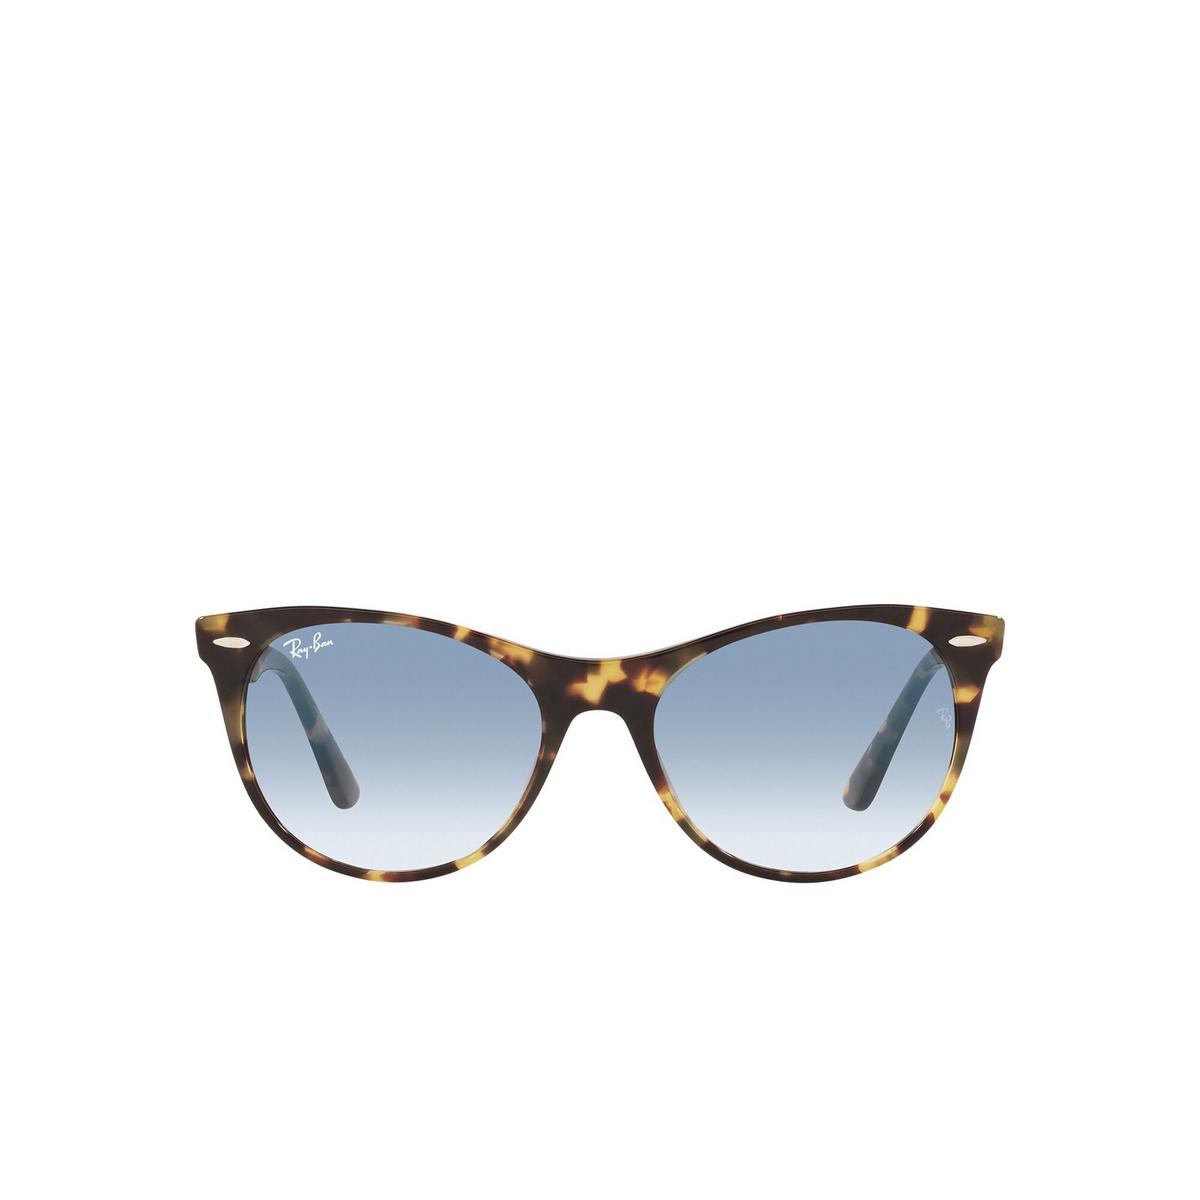 Ray-Ban® Round Sunglasses: Wayfarer Ii RB2185 color Yellow Havana 13323F - front view.